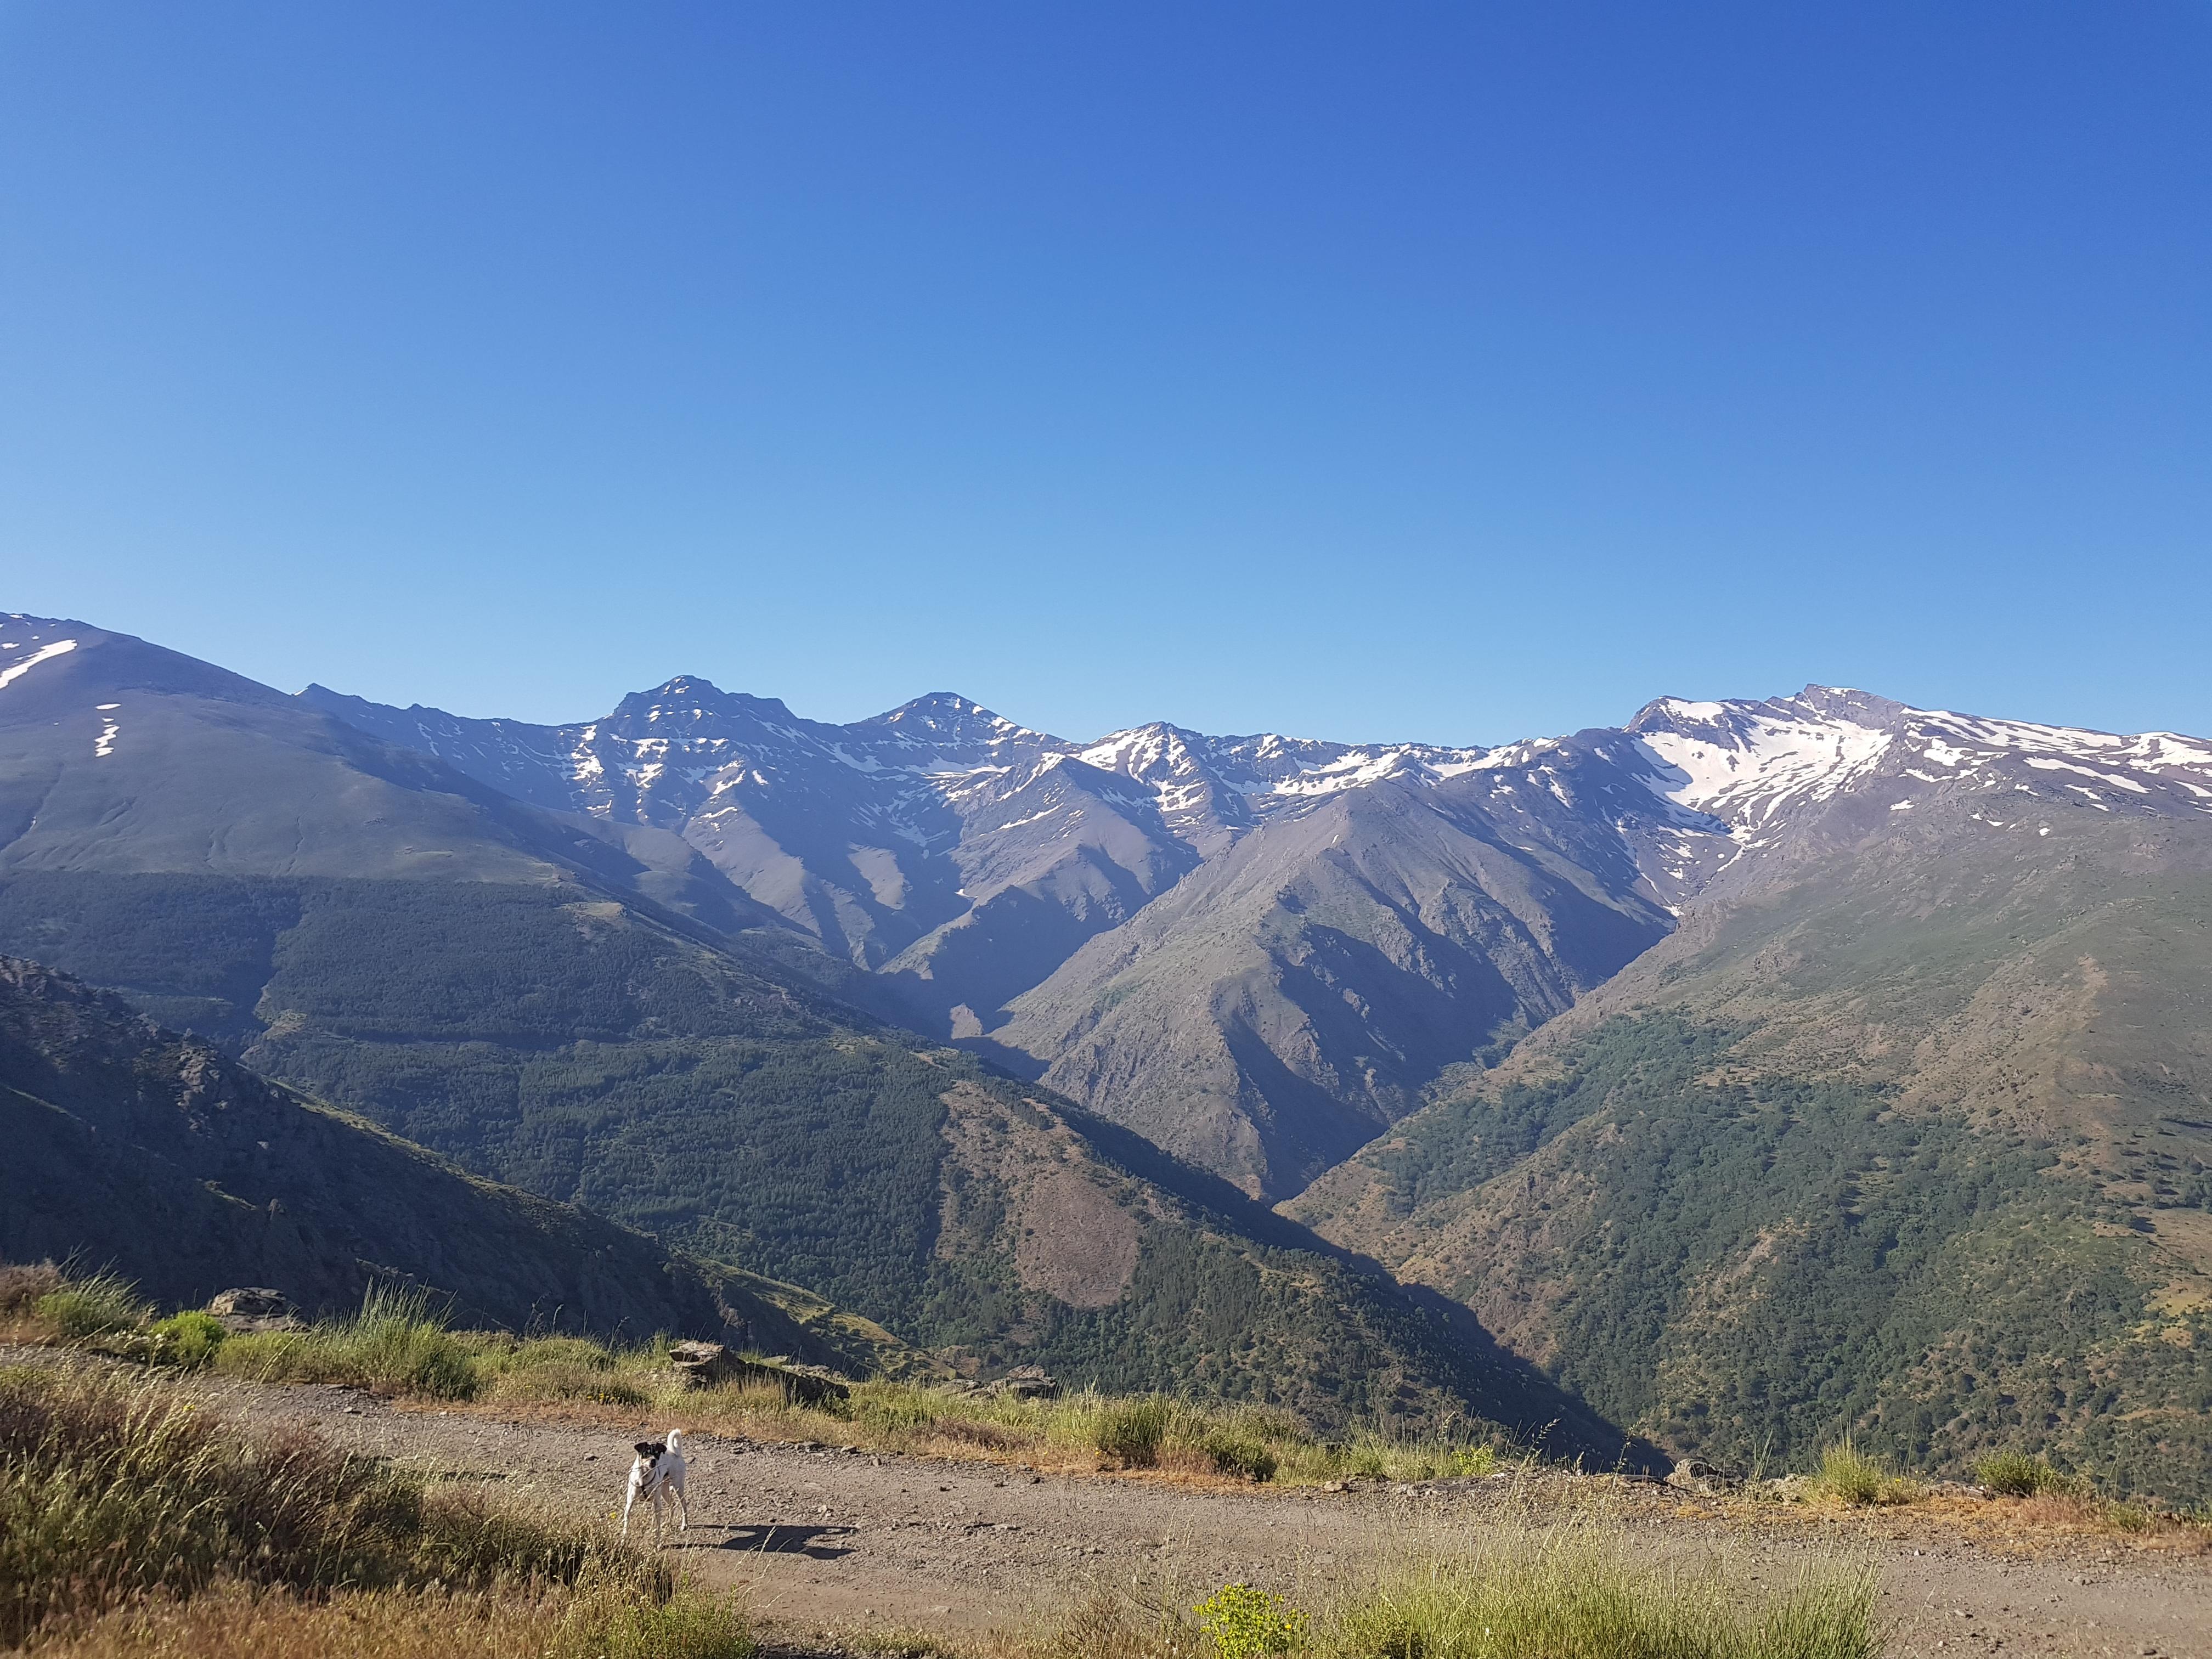 Cumbres en Sierra Nevada